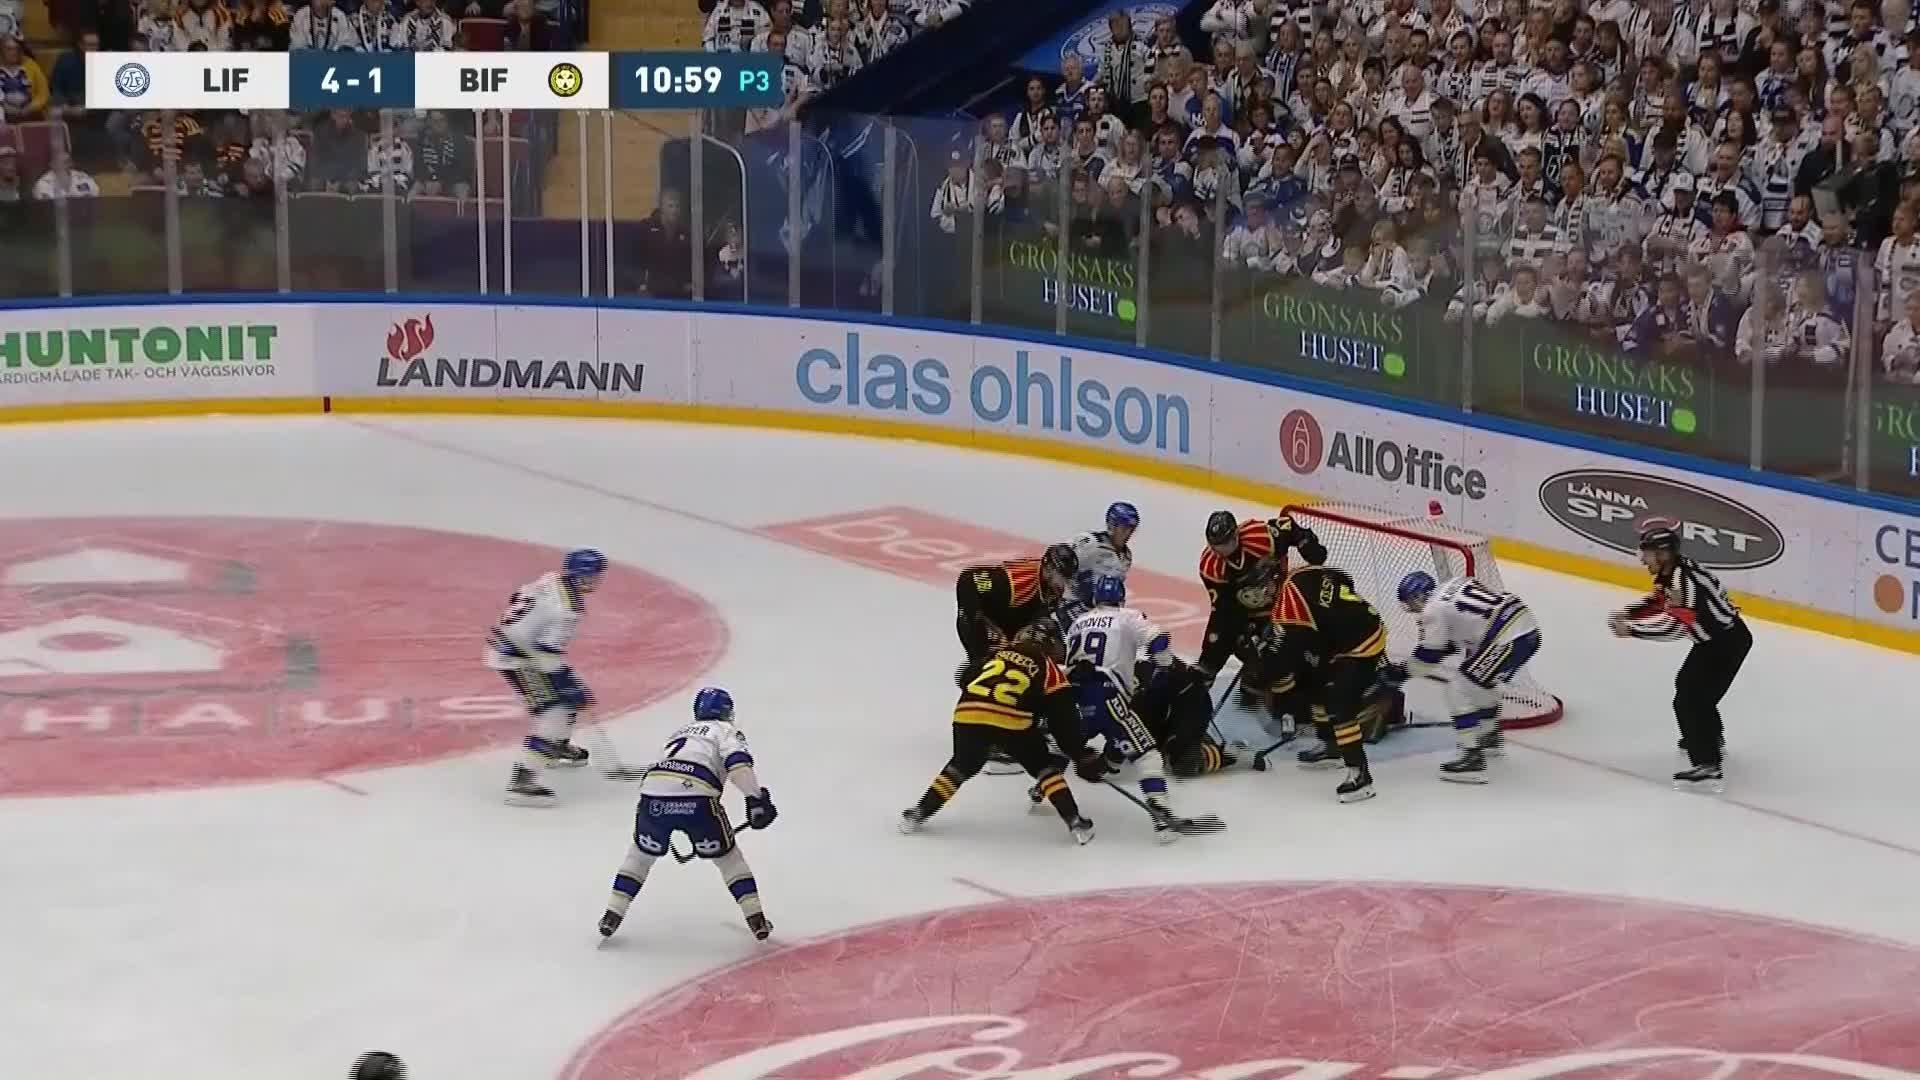 Leksands IF - Brynäs IF 5-1